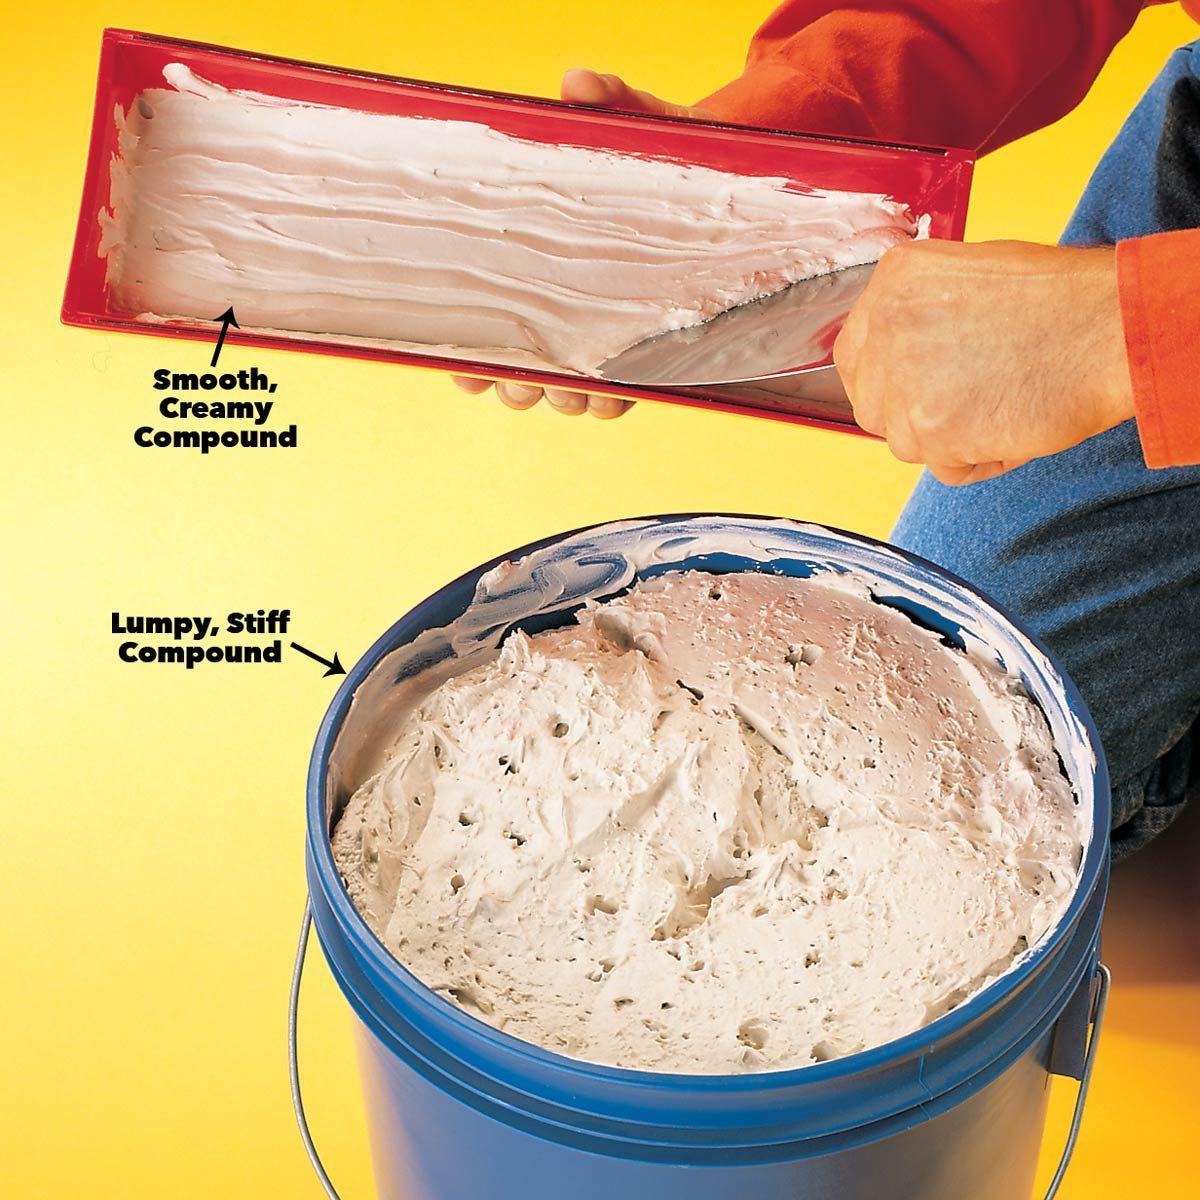 Stir premixed drywall compound